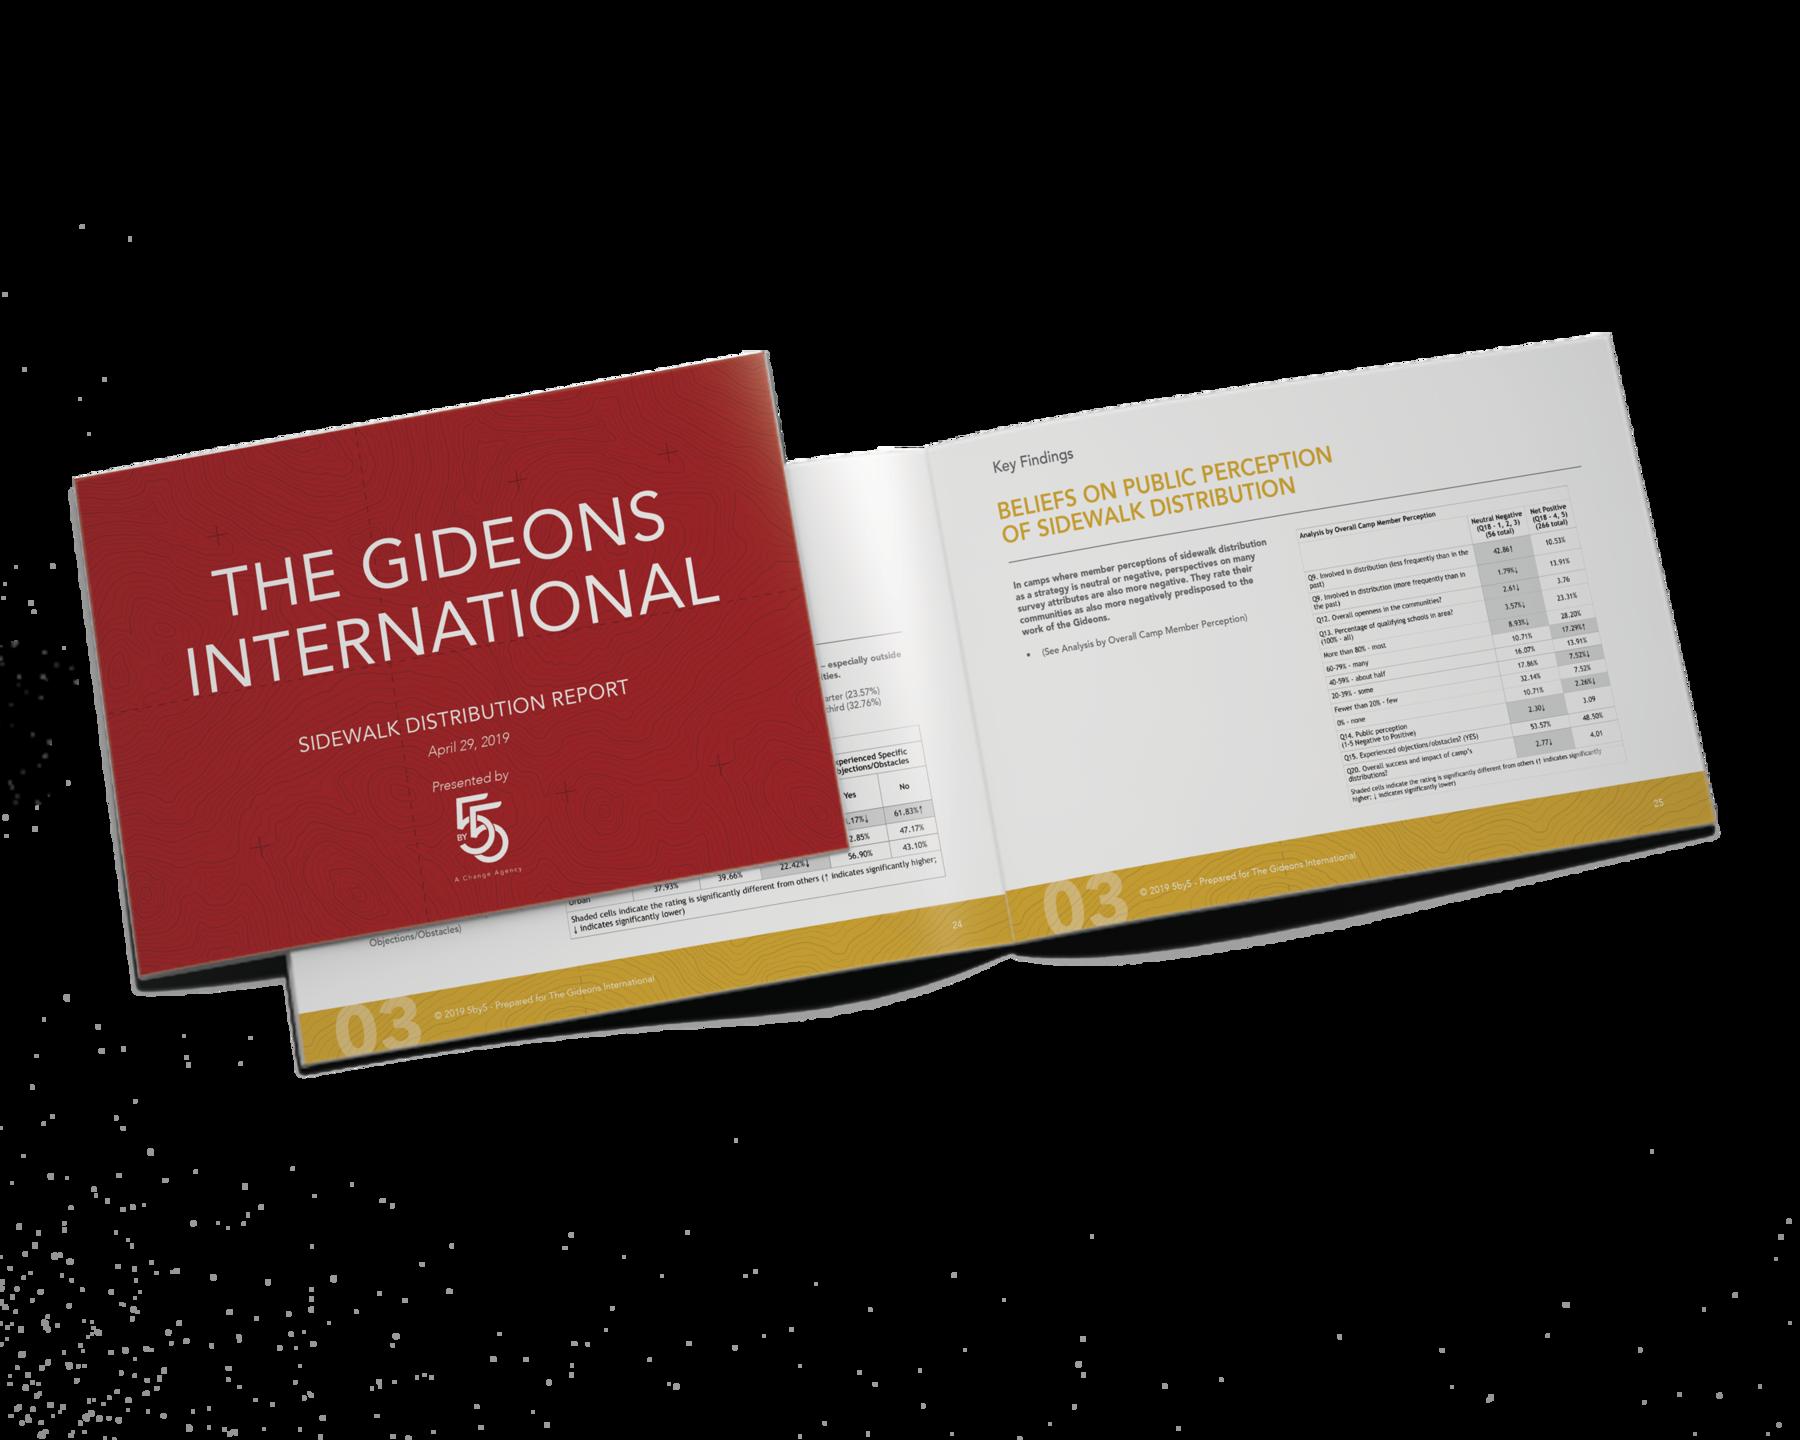 The Gideons International open-booklet mock-up